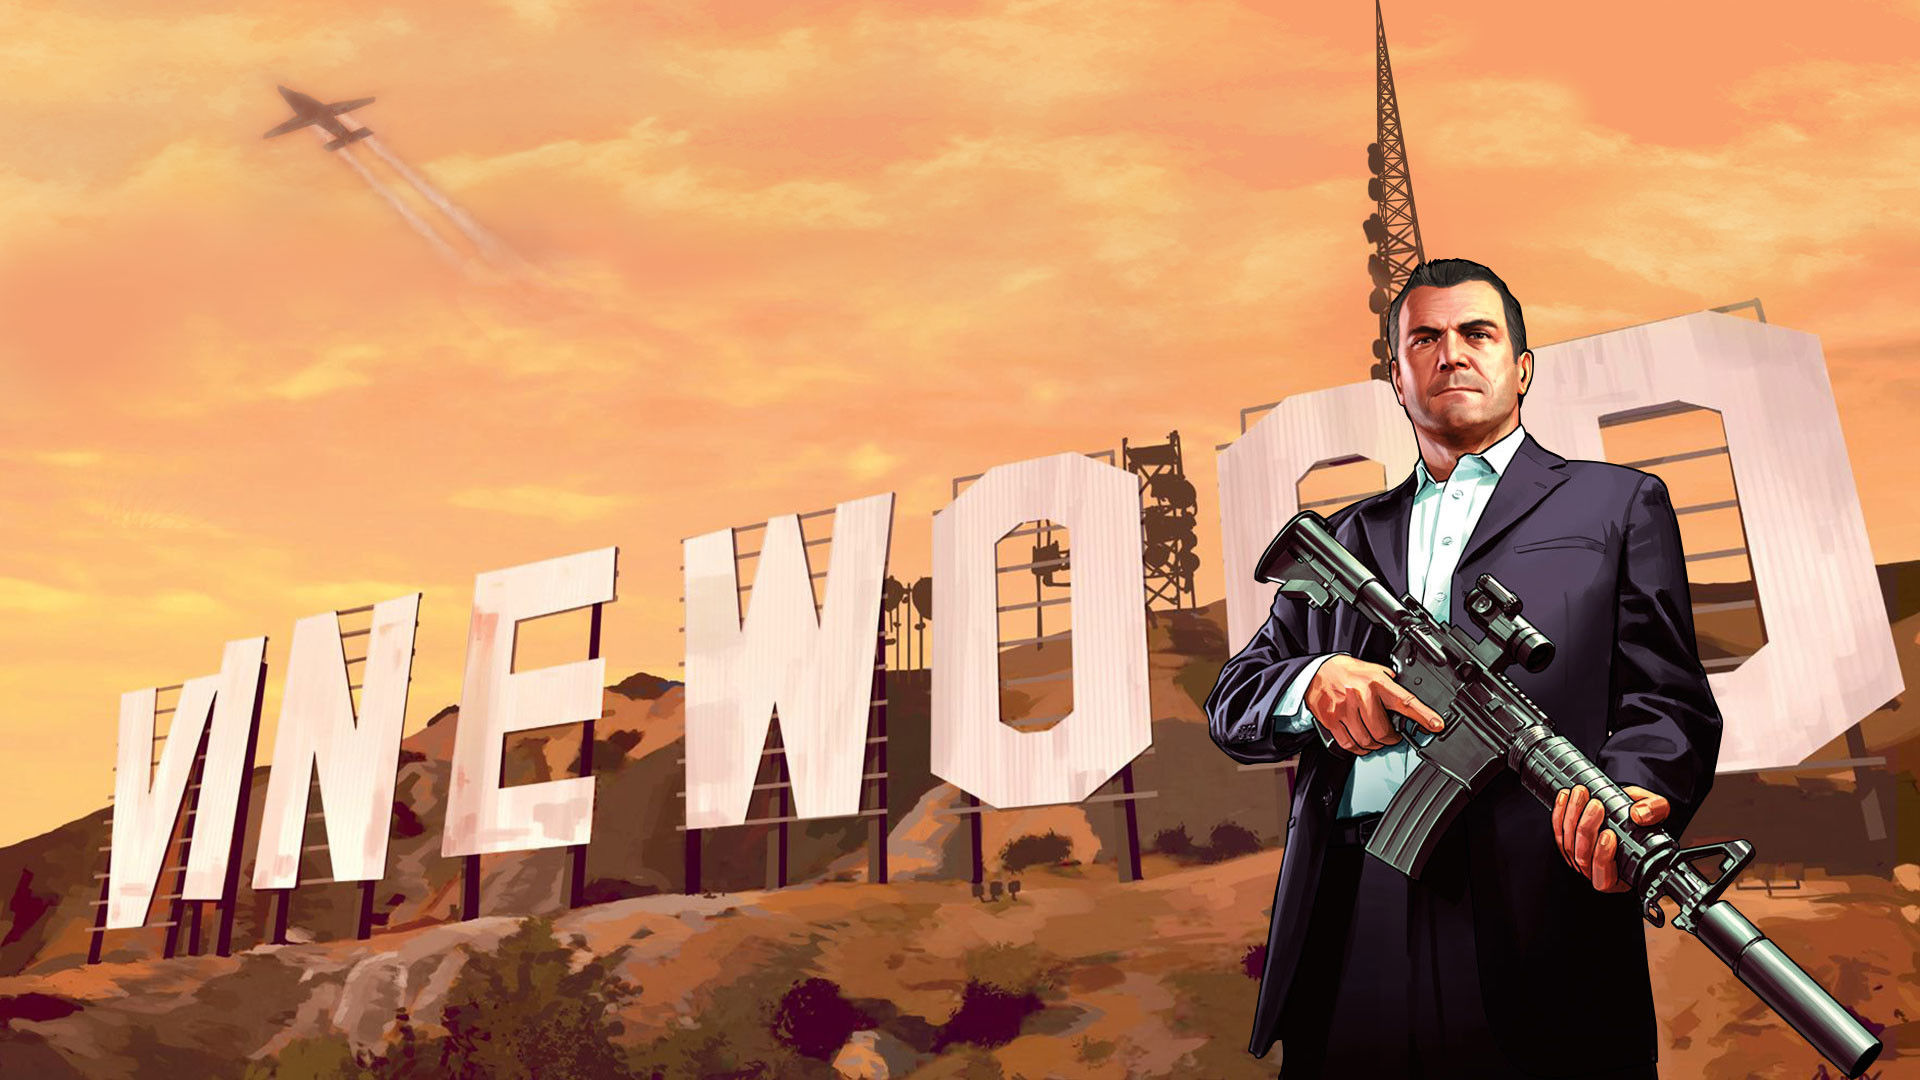 Grand Theft Auto wallpaper HD background download desktop 860×556 Grand  Theft Auto 5 Wallpaper